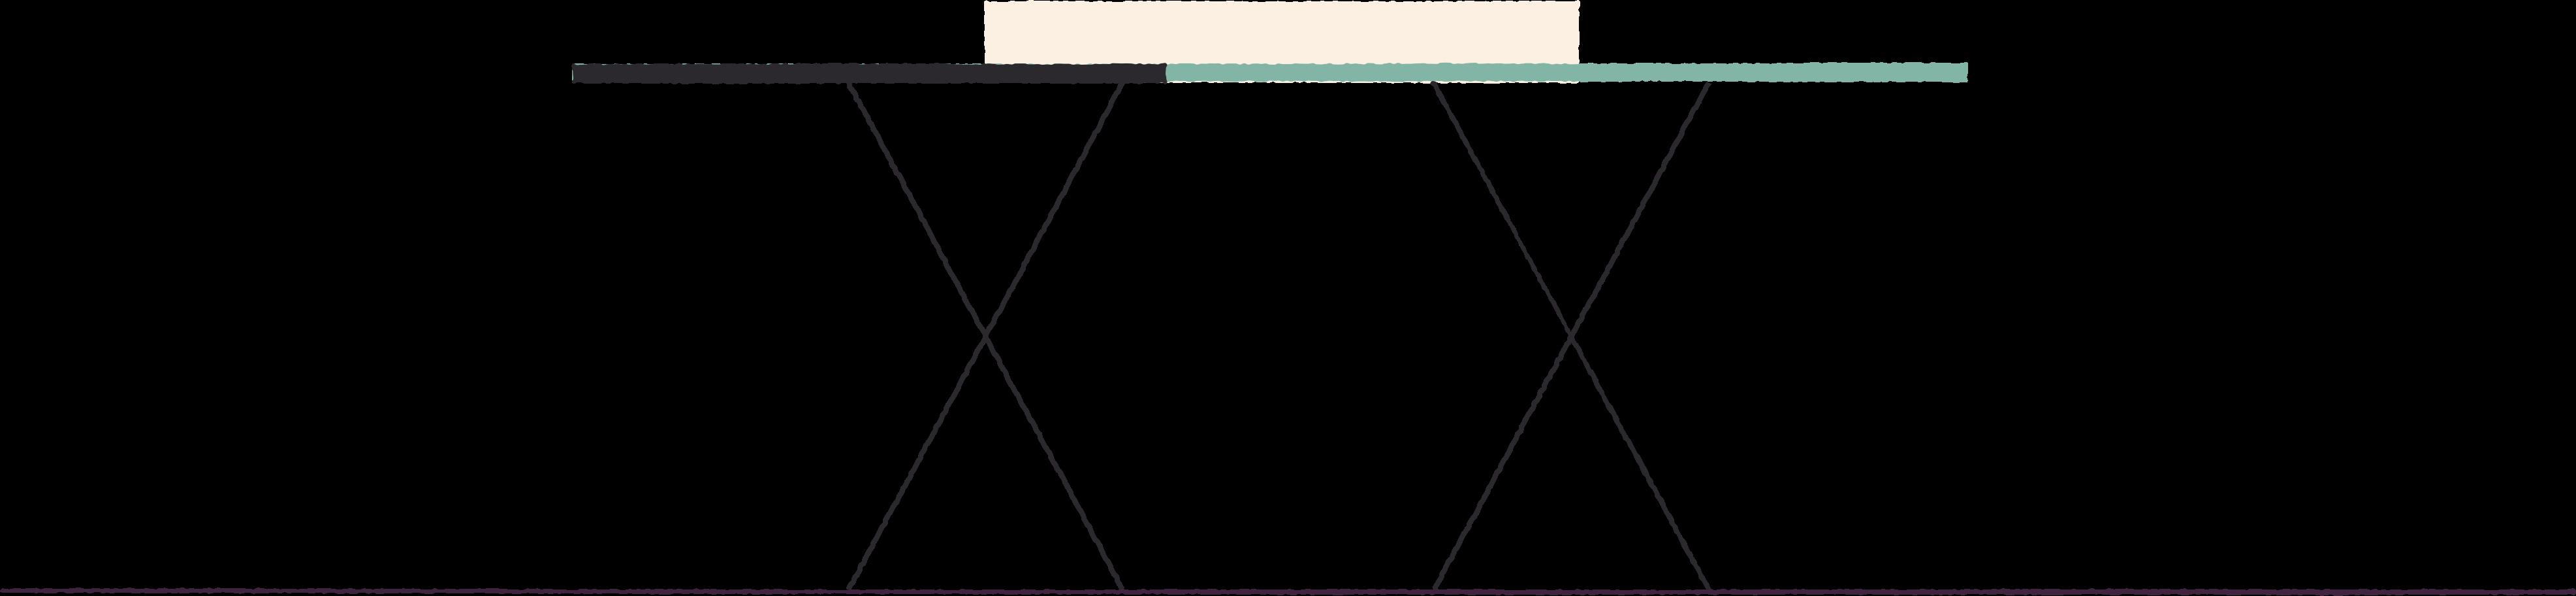 tischtennis Clipart-Grafik als PNG, SVG